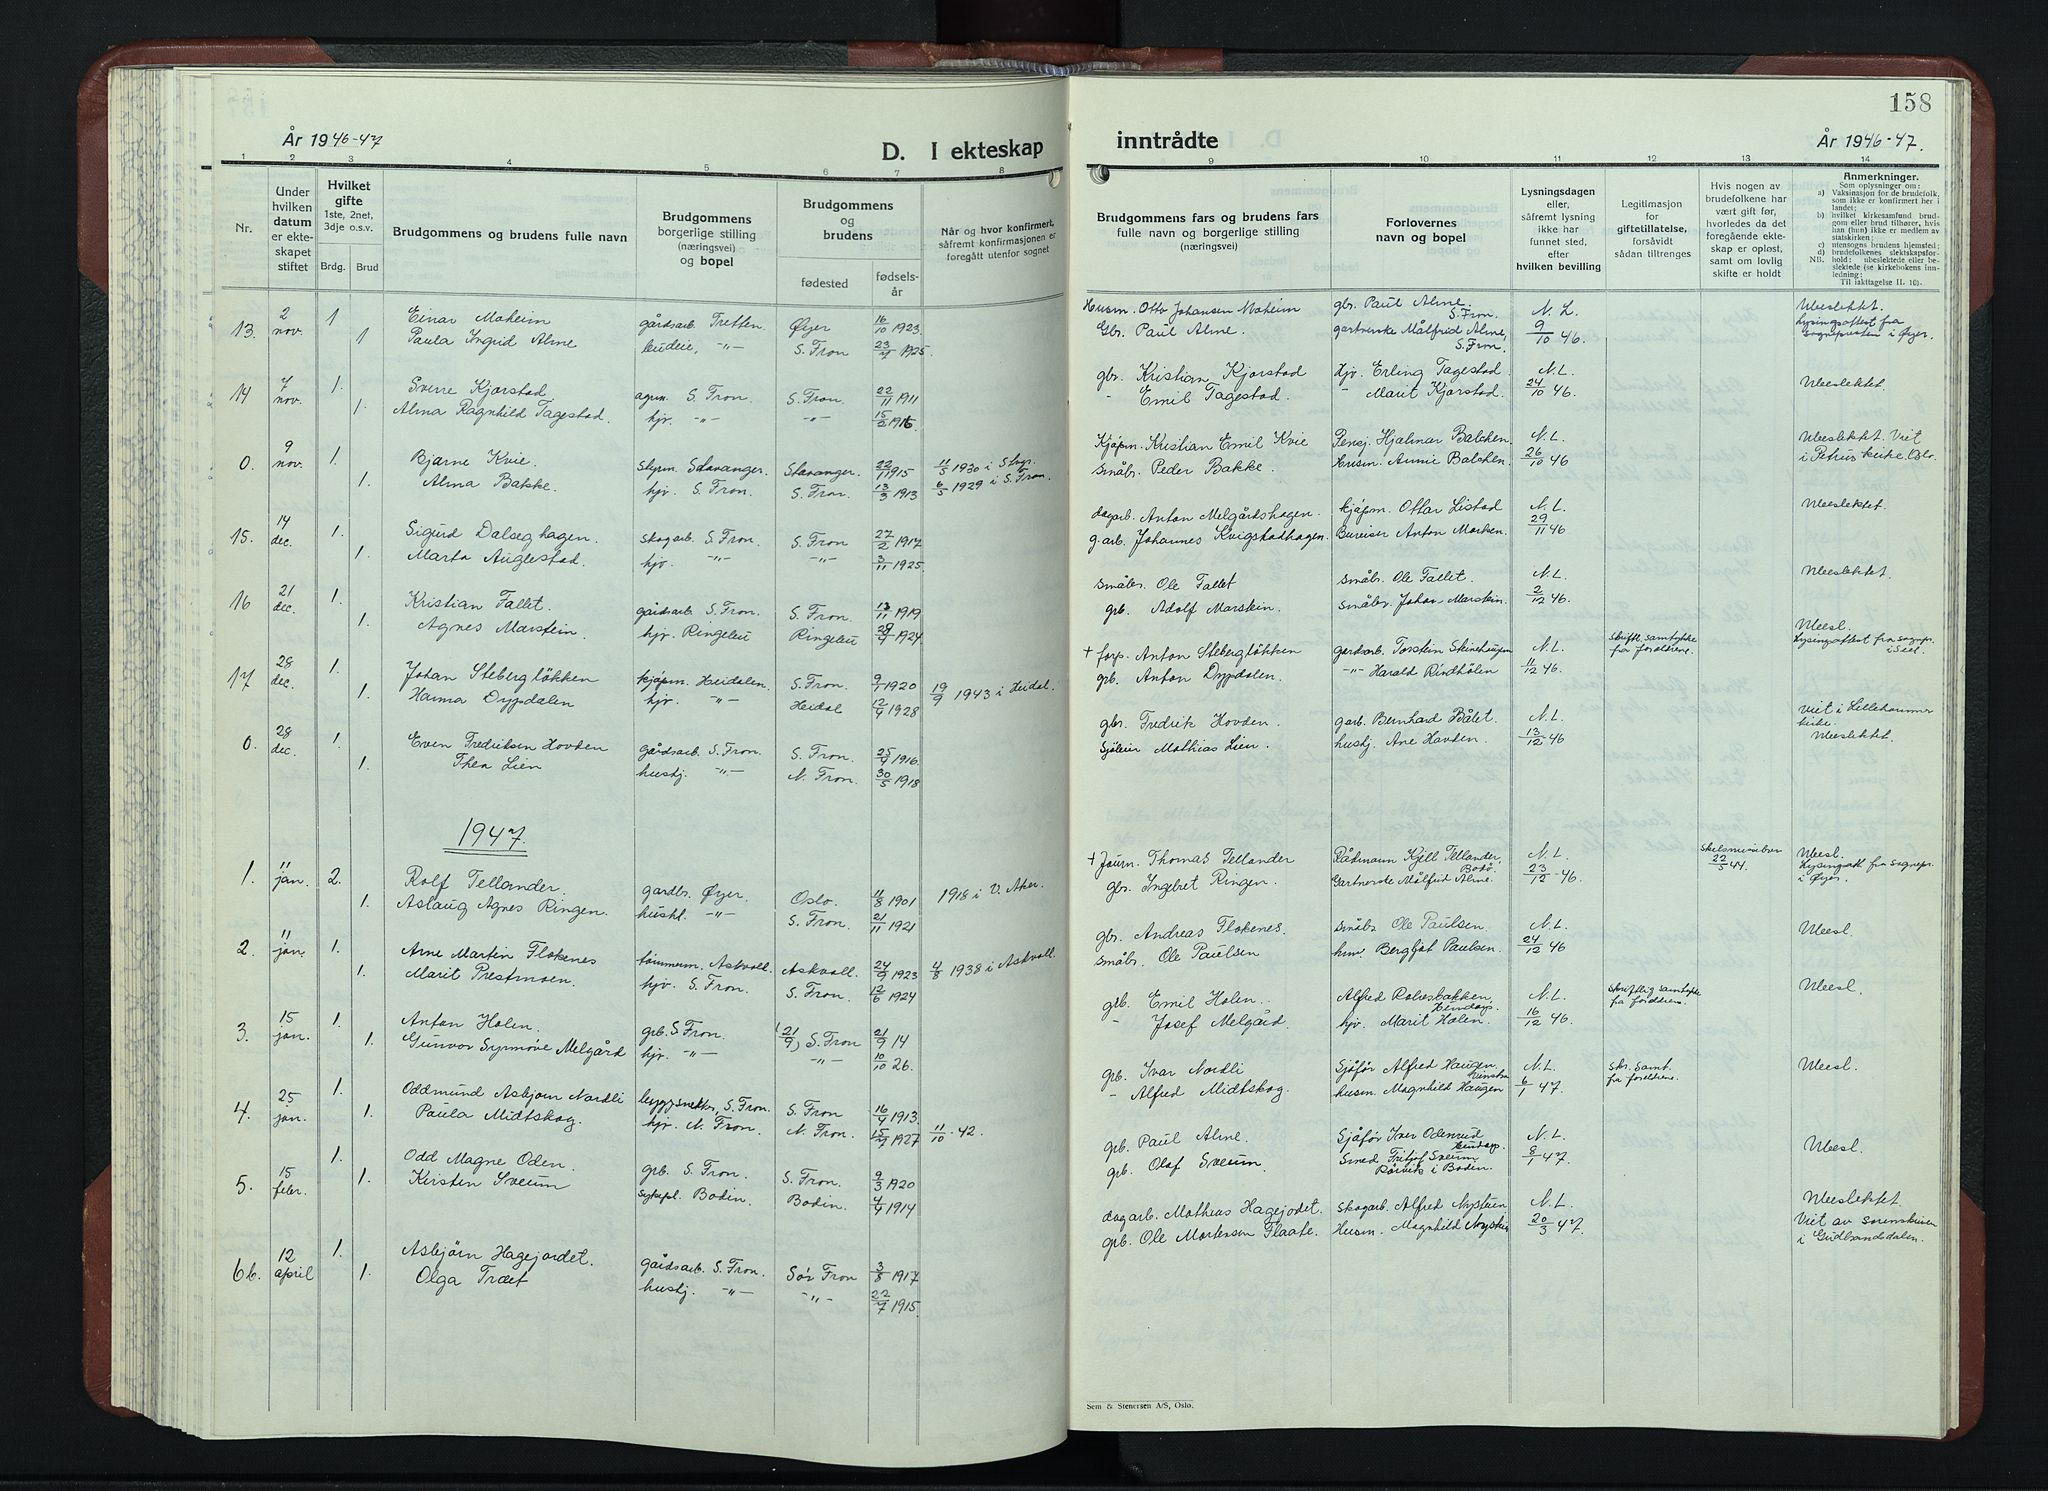 SAH, Sør-Fron prestekontor, H/Ha/Hab/L0006: Klokkerbok nr. 6, 1933-1948, s. 158